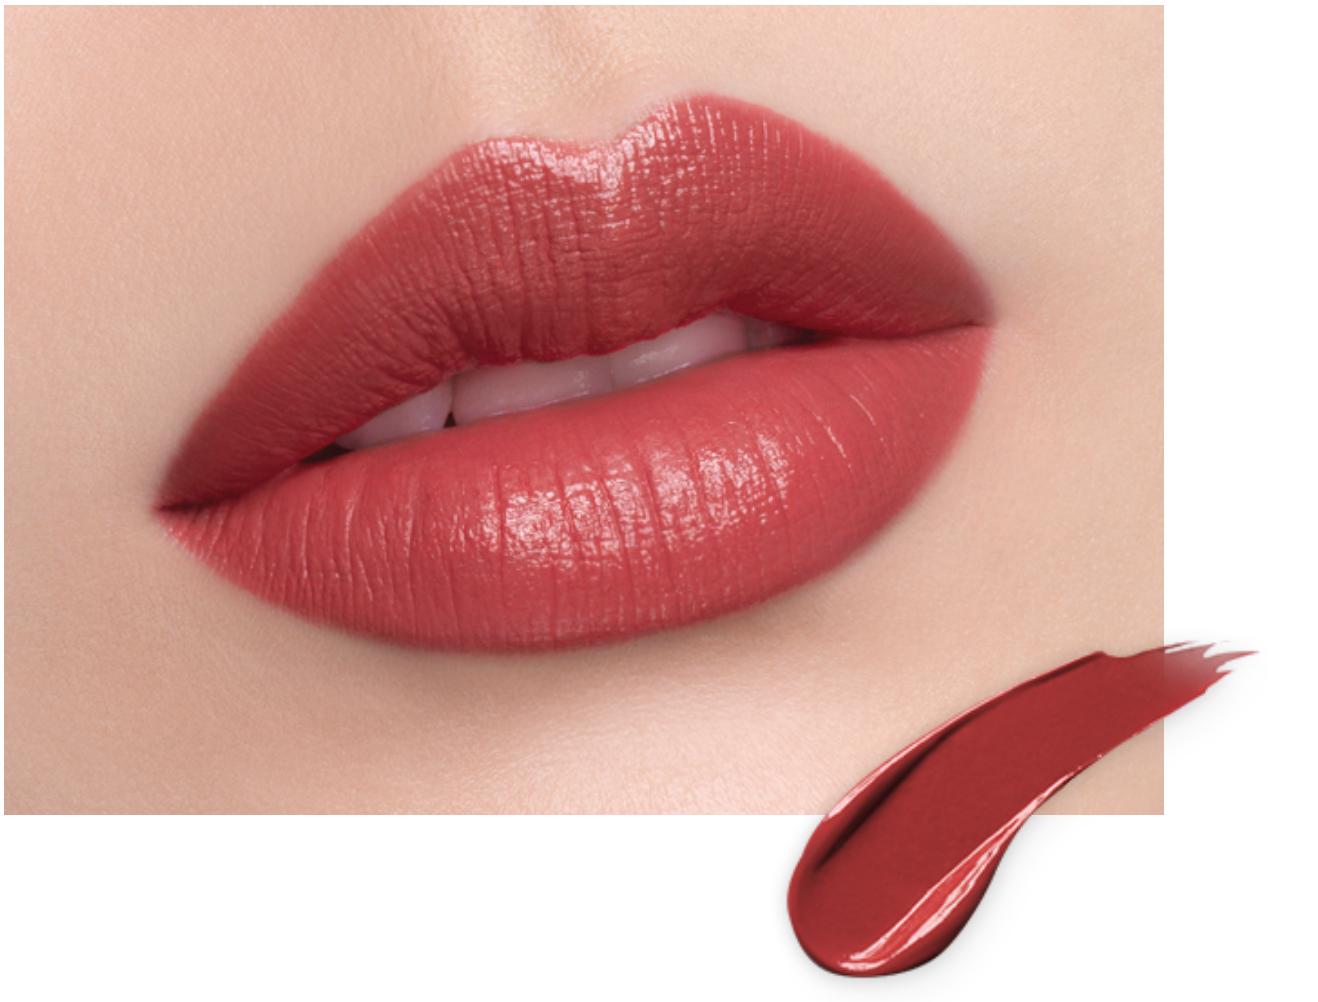 laneige-silk-intense-lipstick-320.png